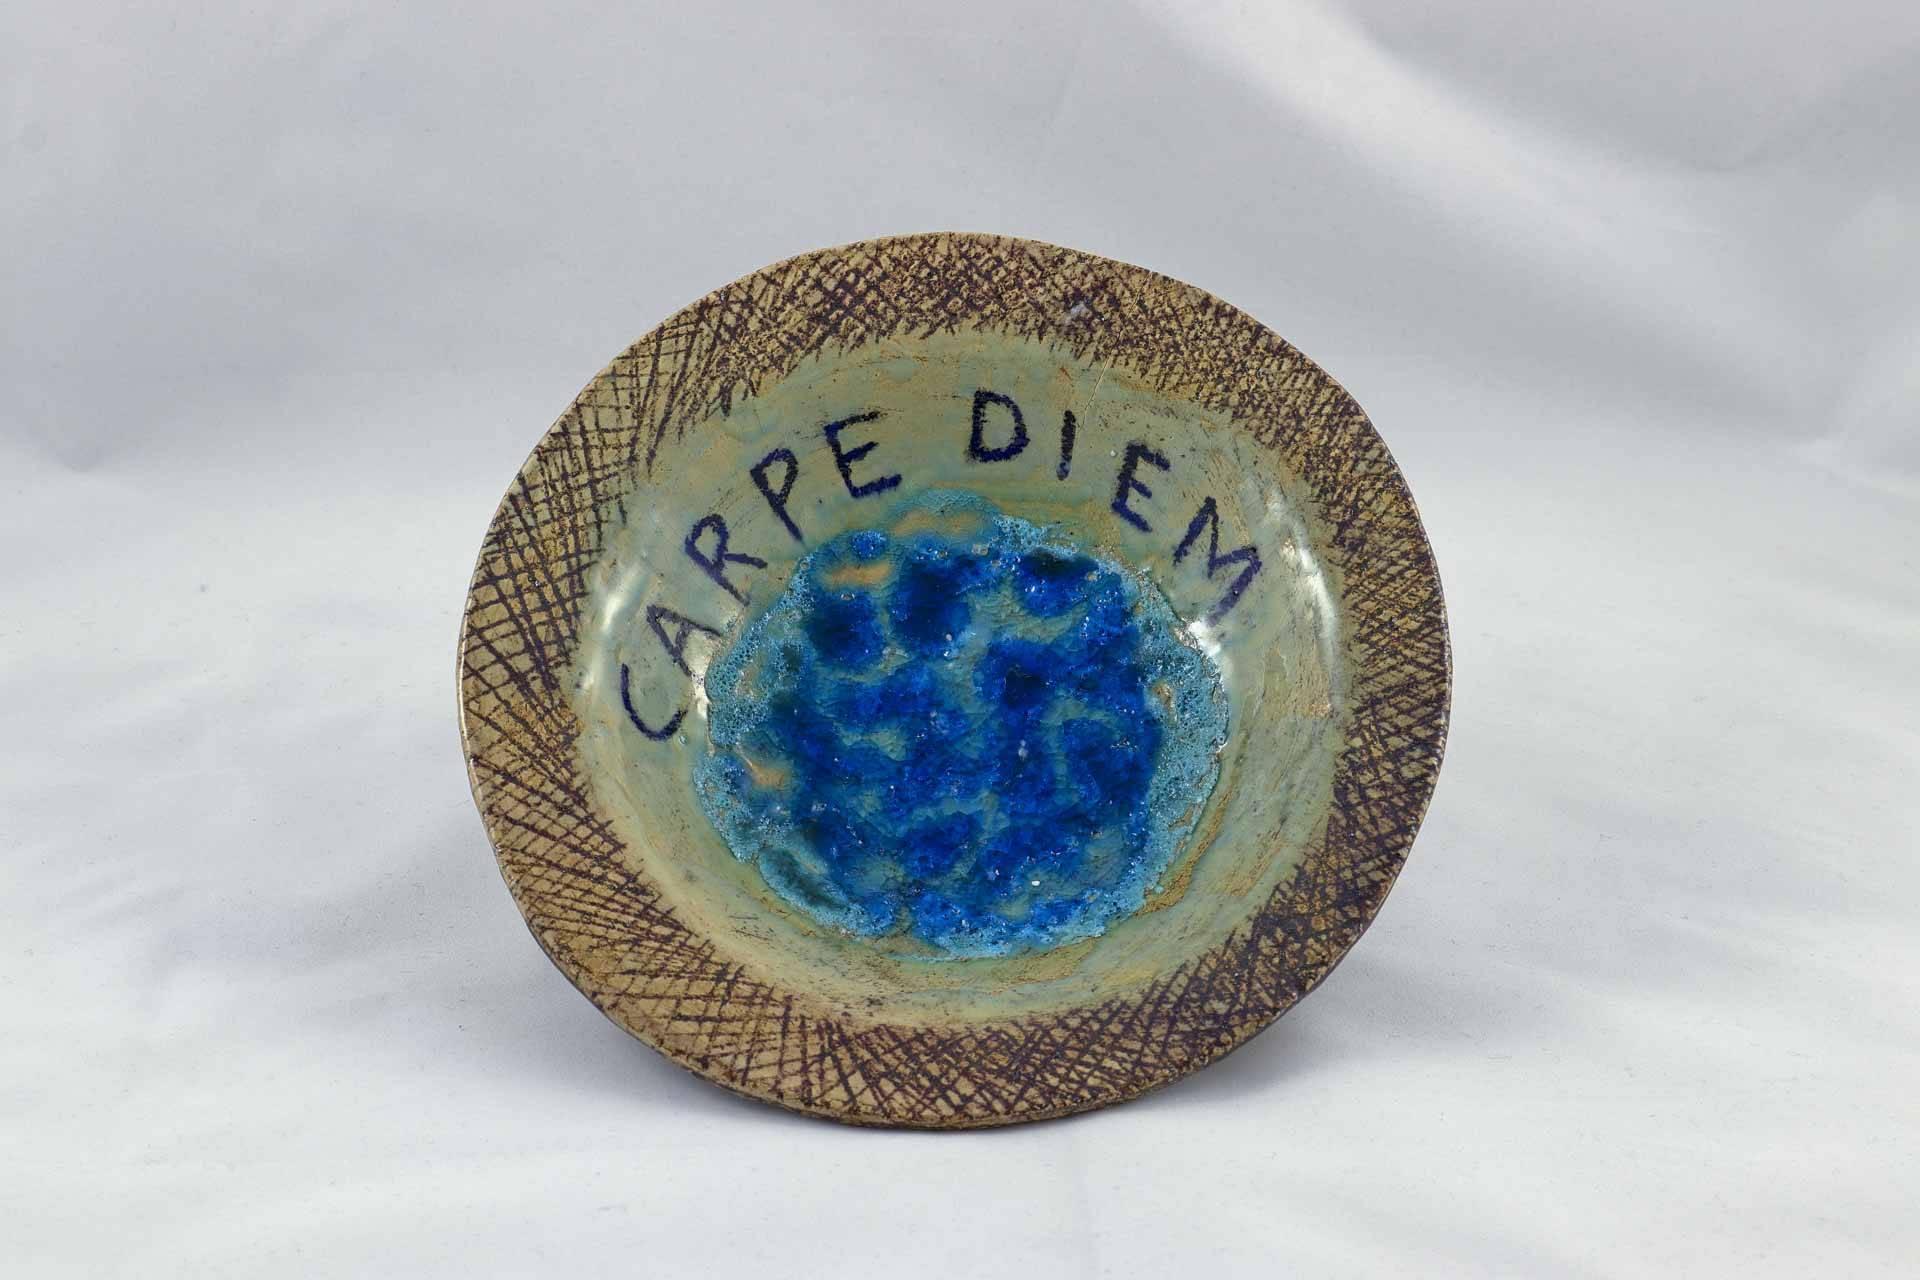 Petra Zobl Keramik - Schale Carpe Diem Manganspinell transparent geschmolzenes Glas 2